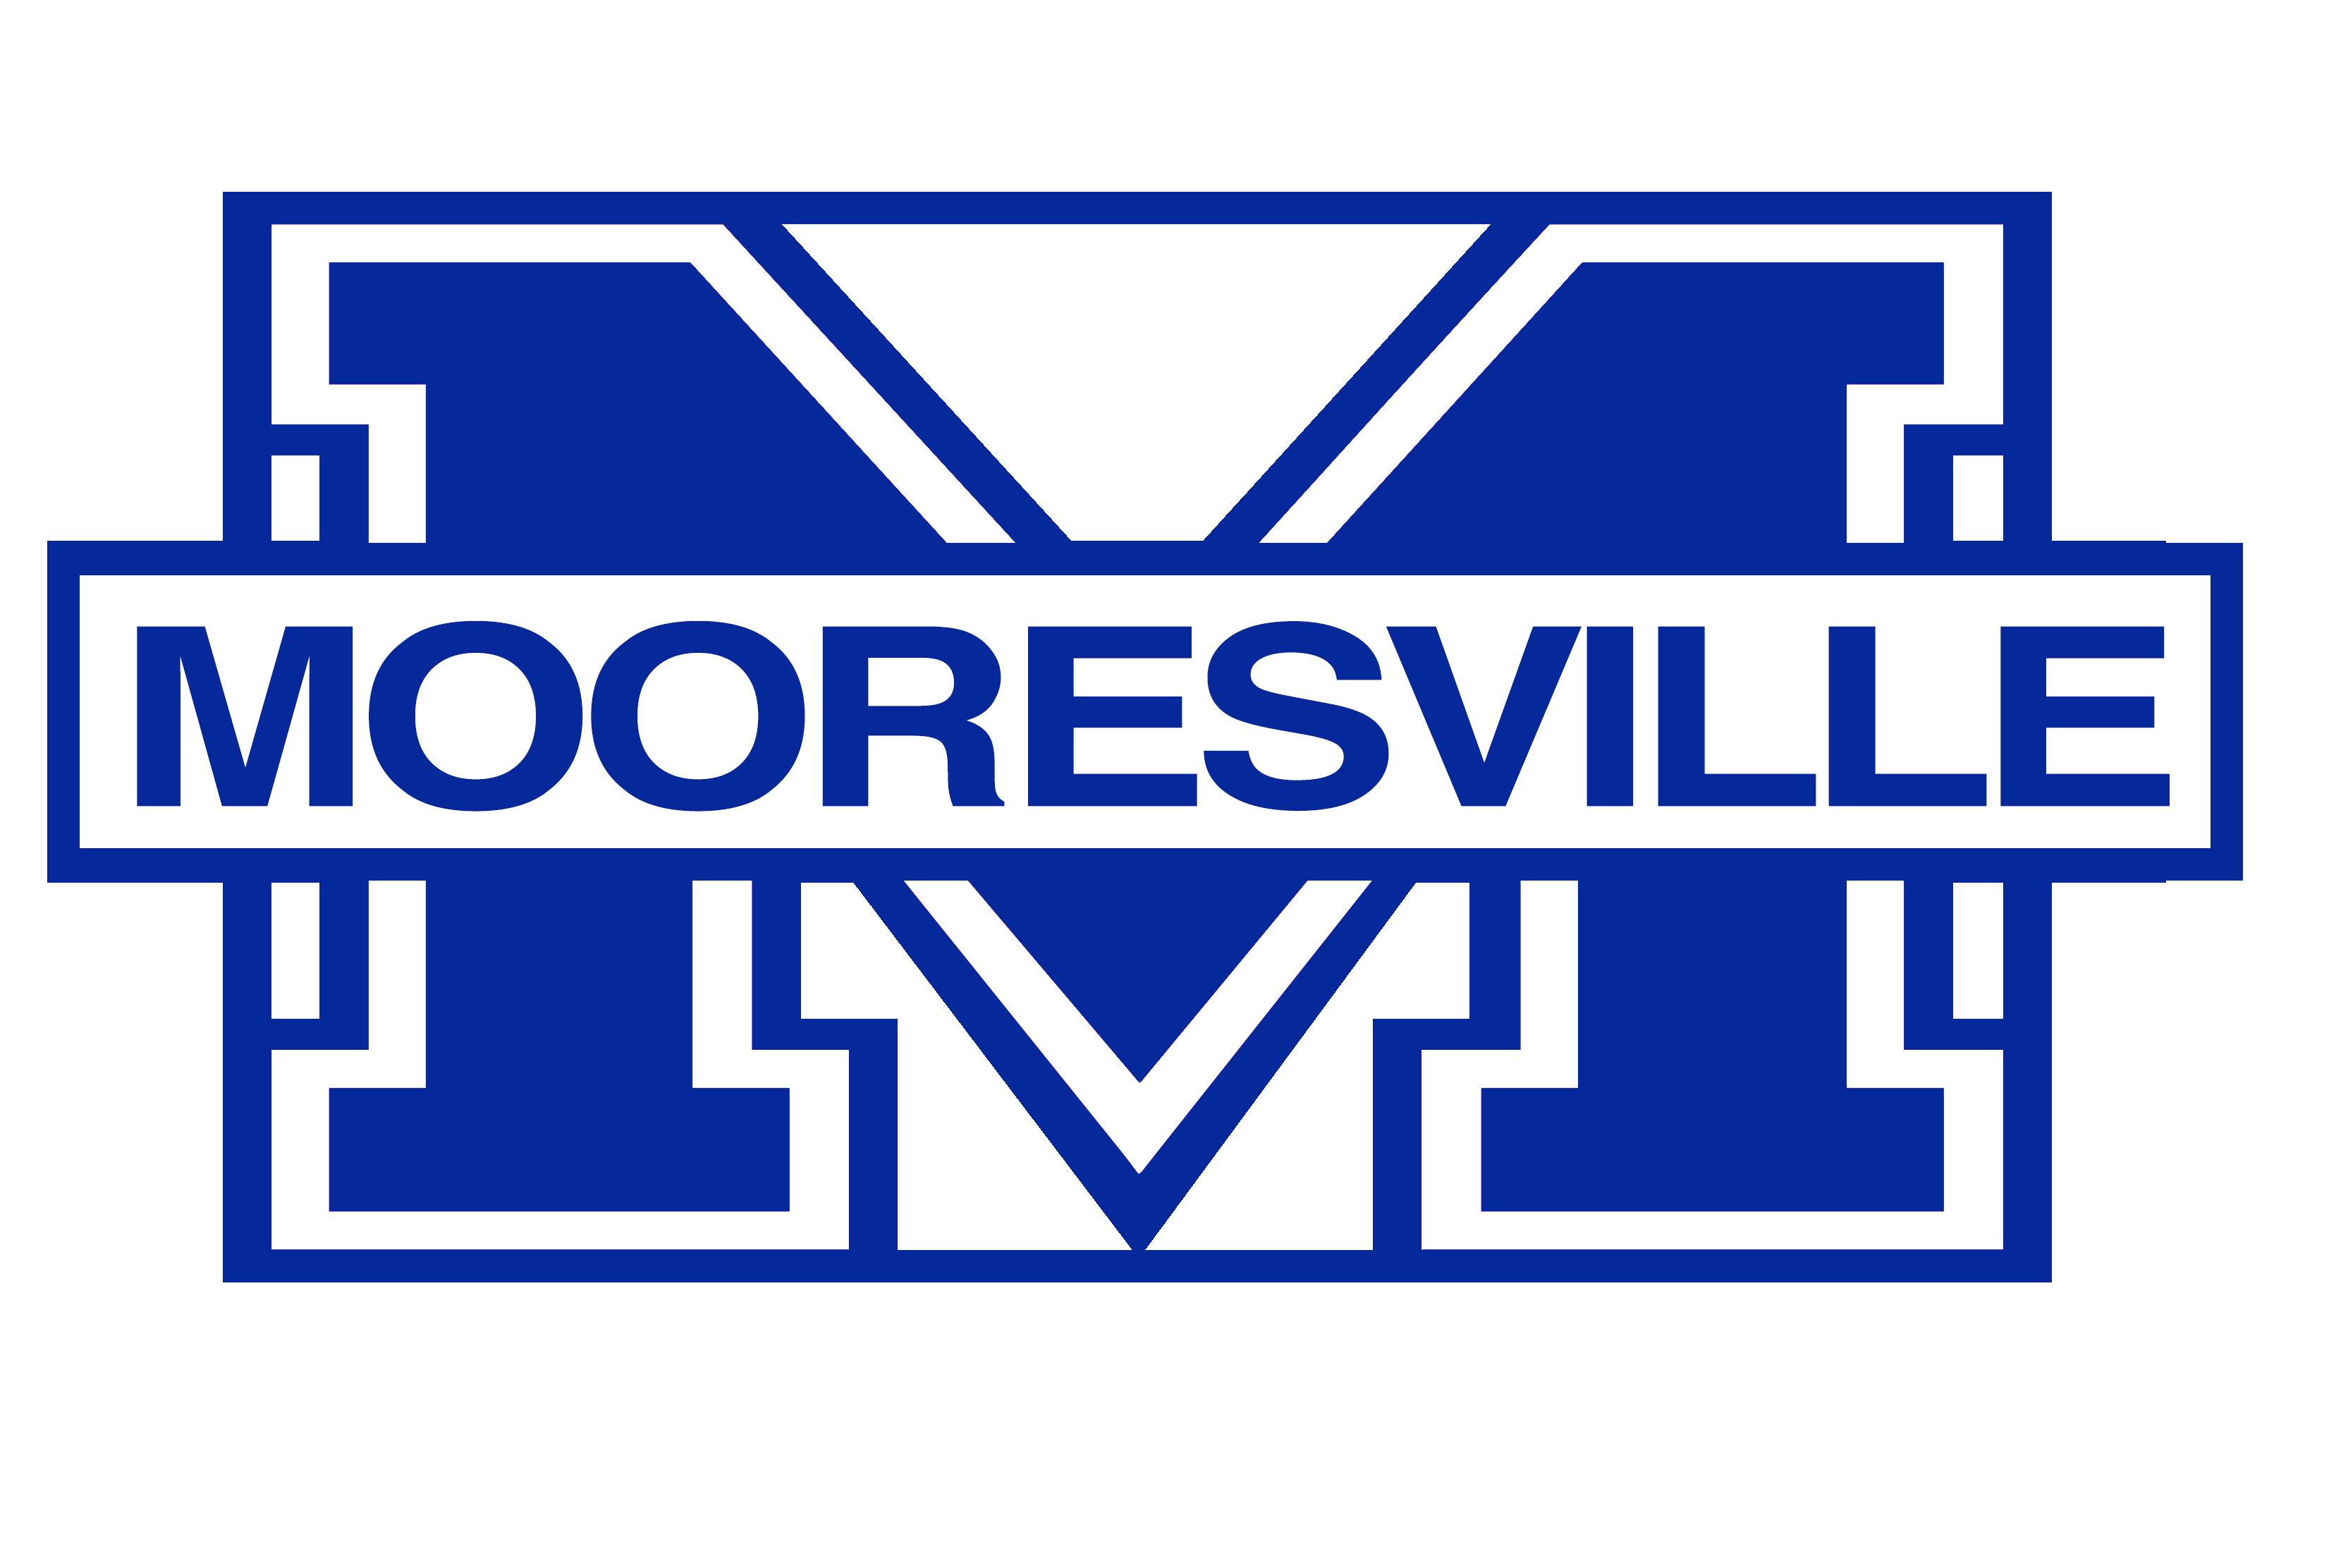 Mooreville High School logo